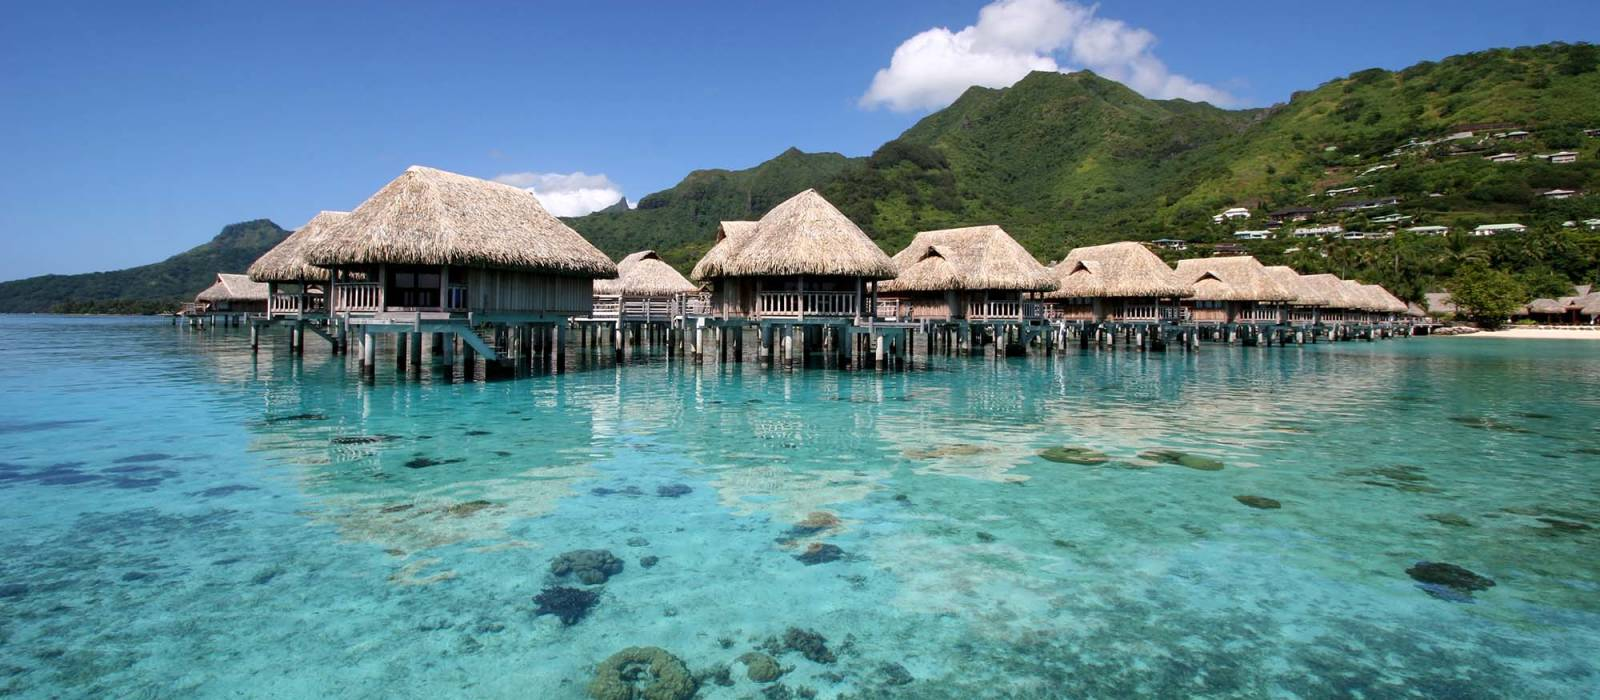 Geheimnisse des Südpazifiks – Tahiti, Bora Bora und Blaue Lagune Urlaub 1